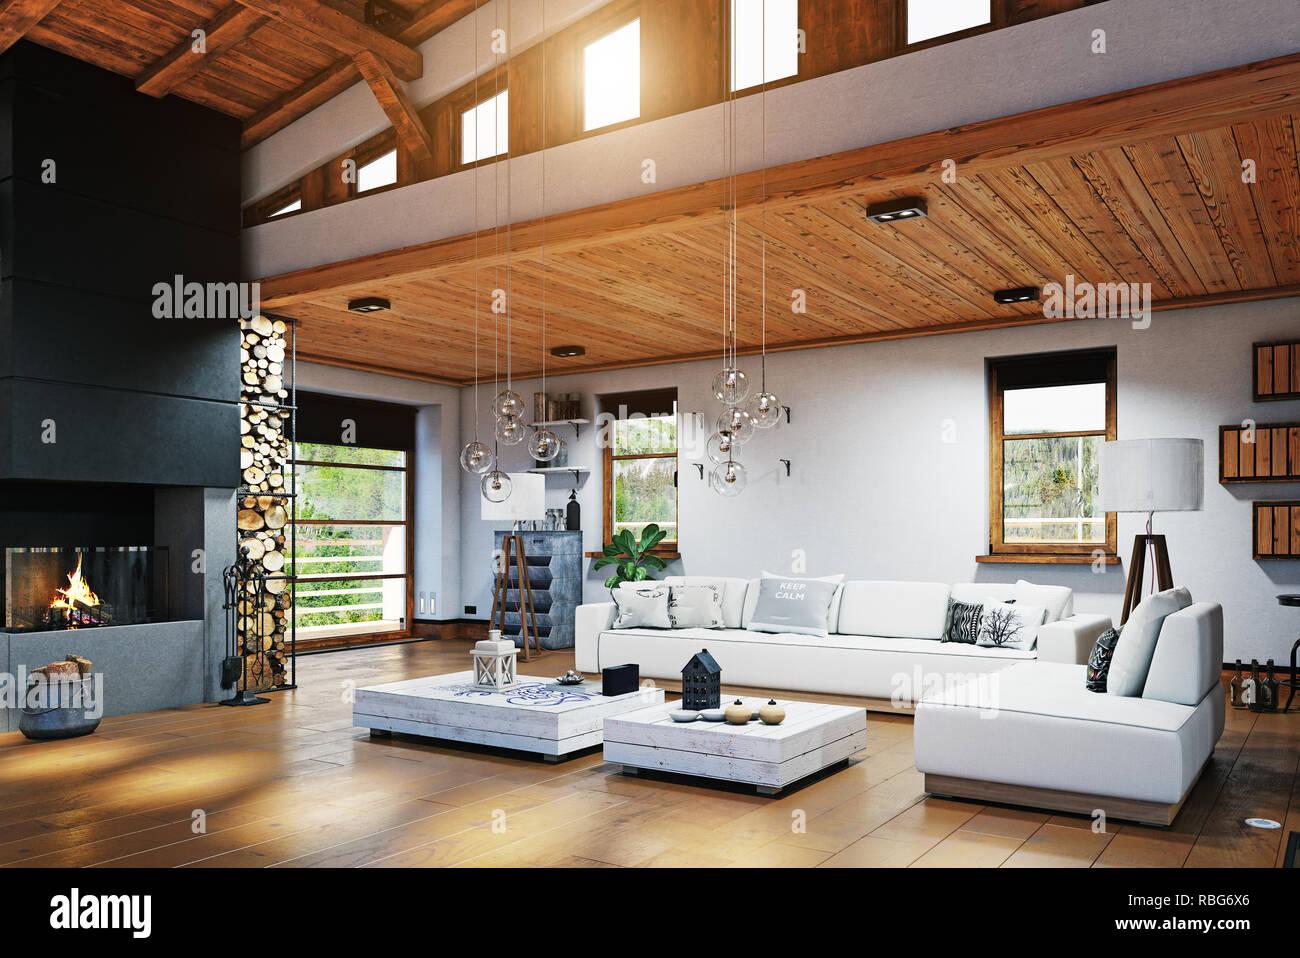 Modernes Chalet Interieur. 3D-Rendering Stockfoto, Bild ...